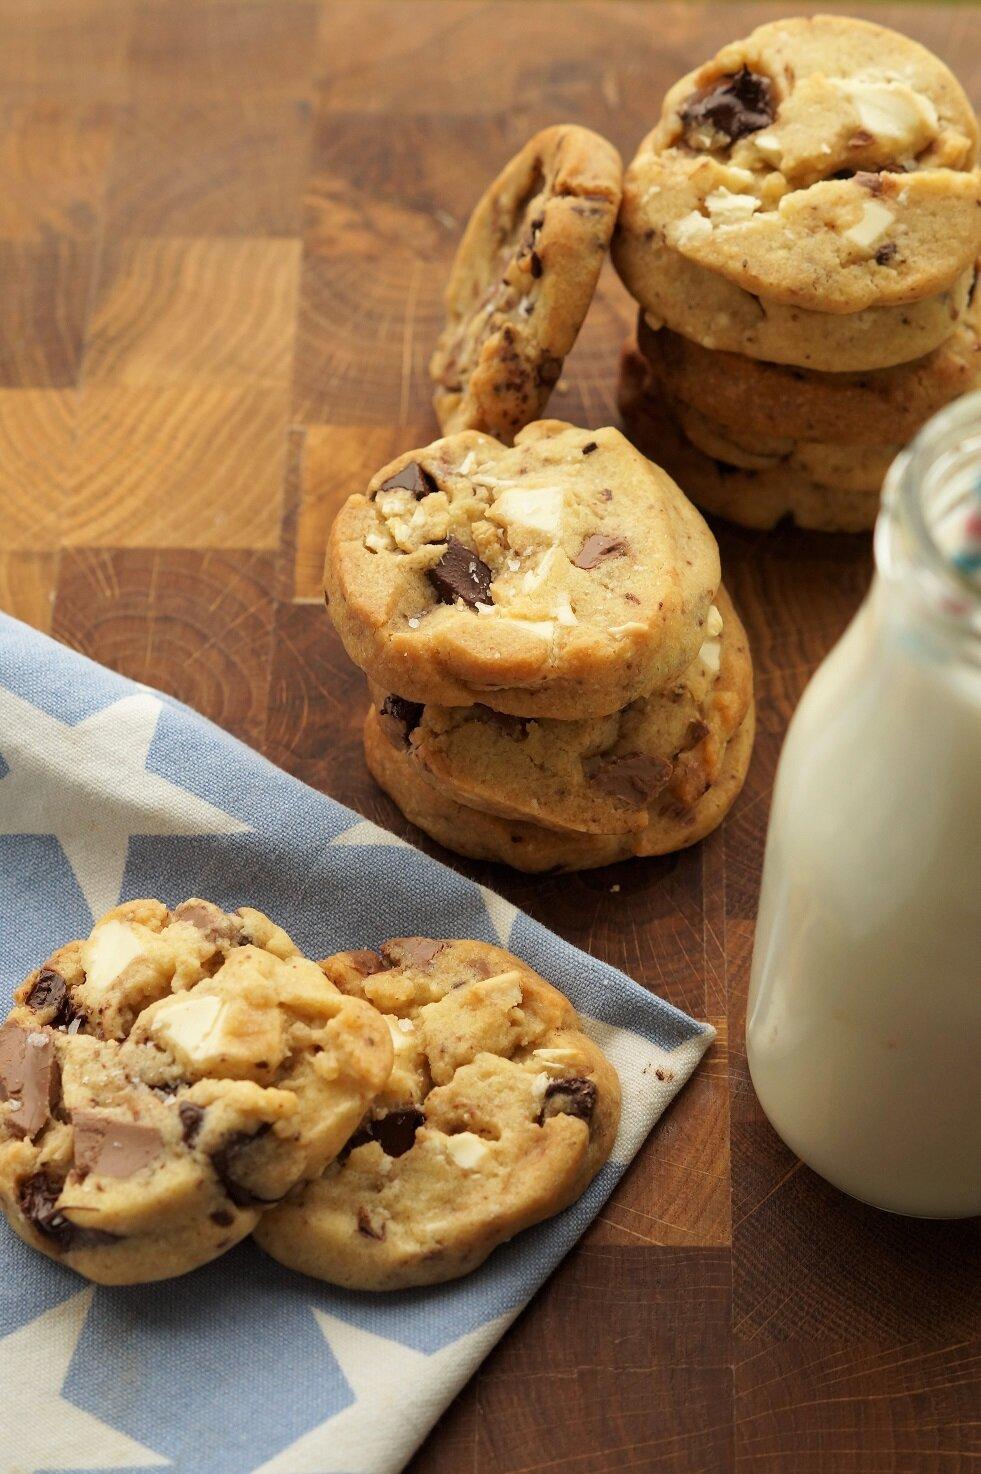 Trippel sjokolade-cookies med havsalt